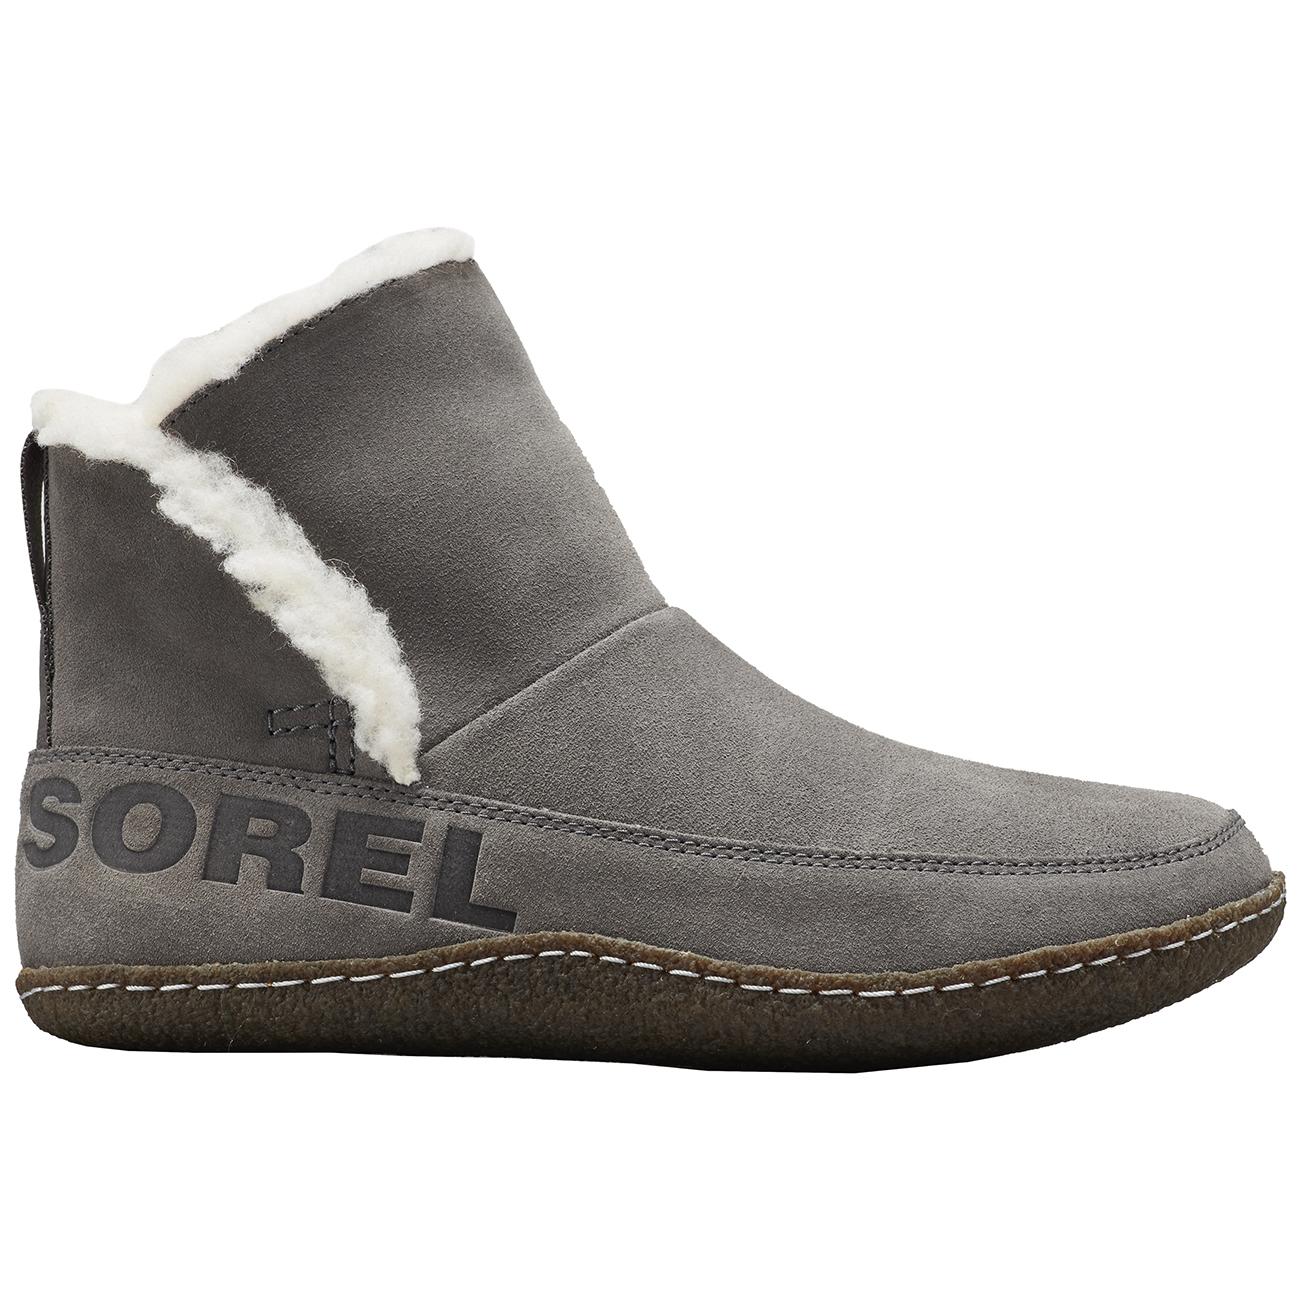 Sorel Nakiska Bootie